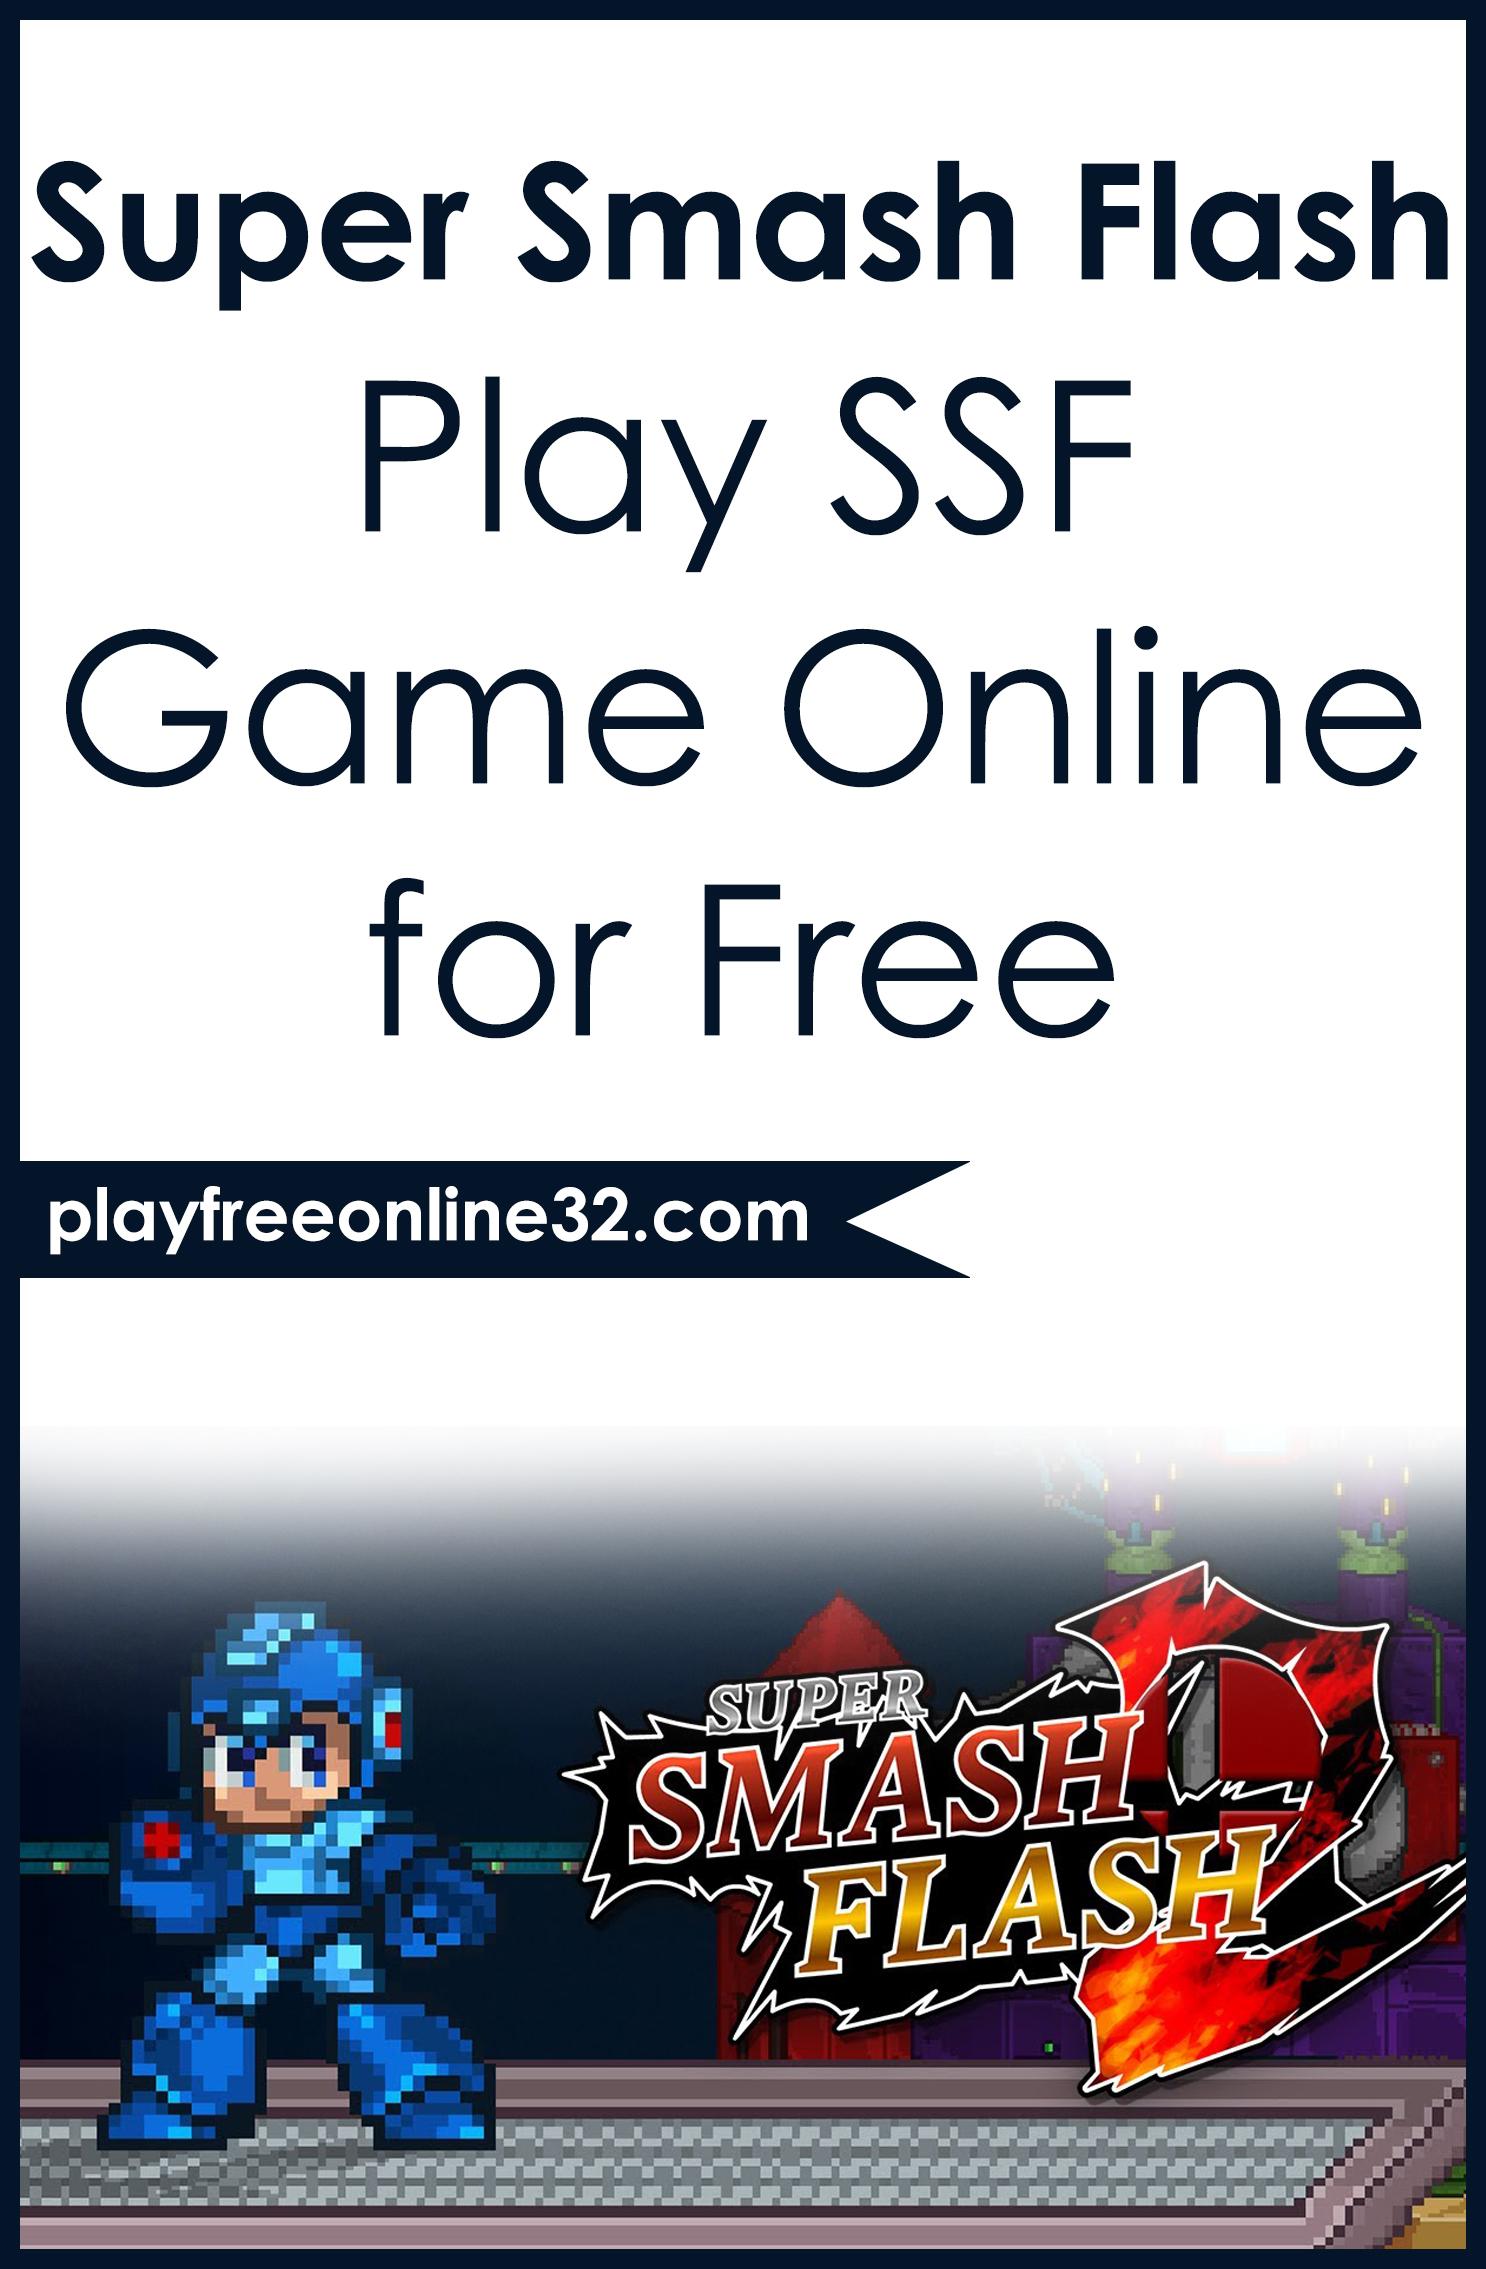 Super Smash Flash • Play SSF Game Online for Free Pinterest